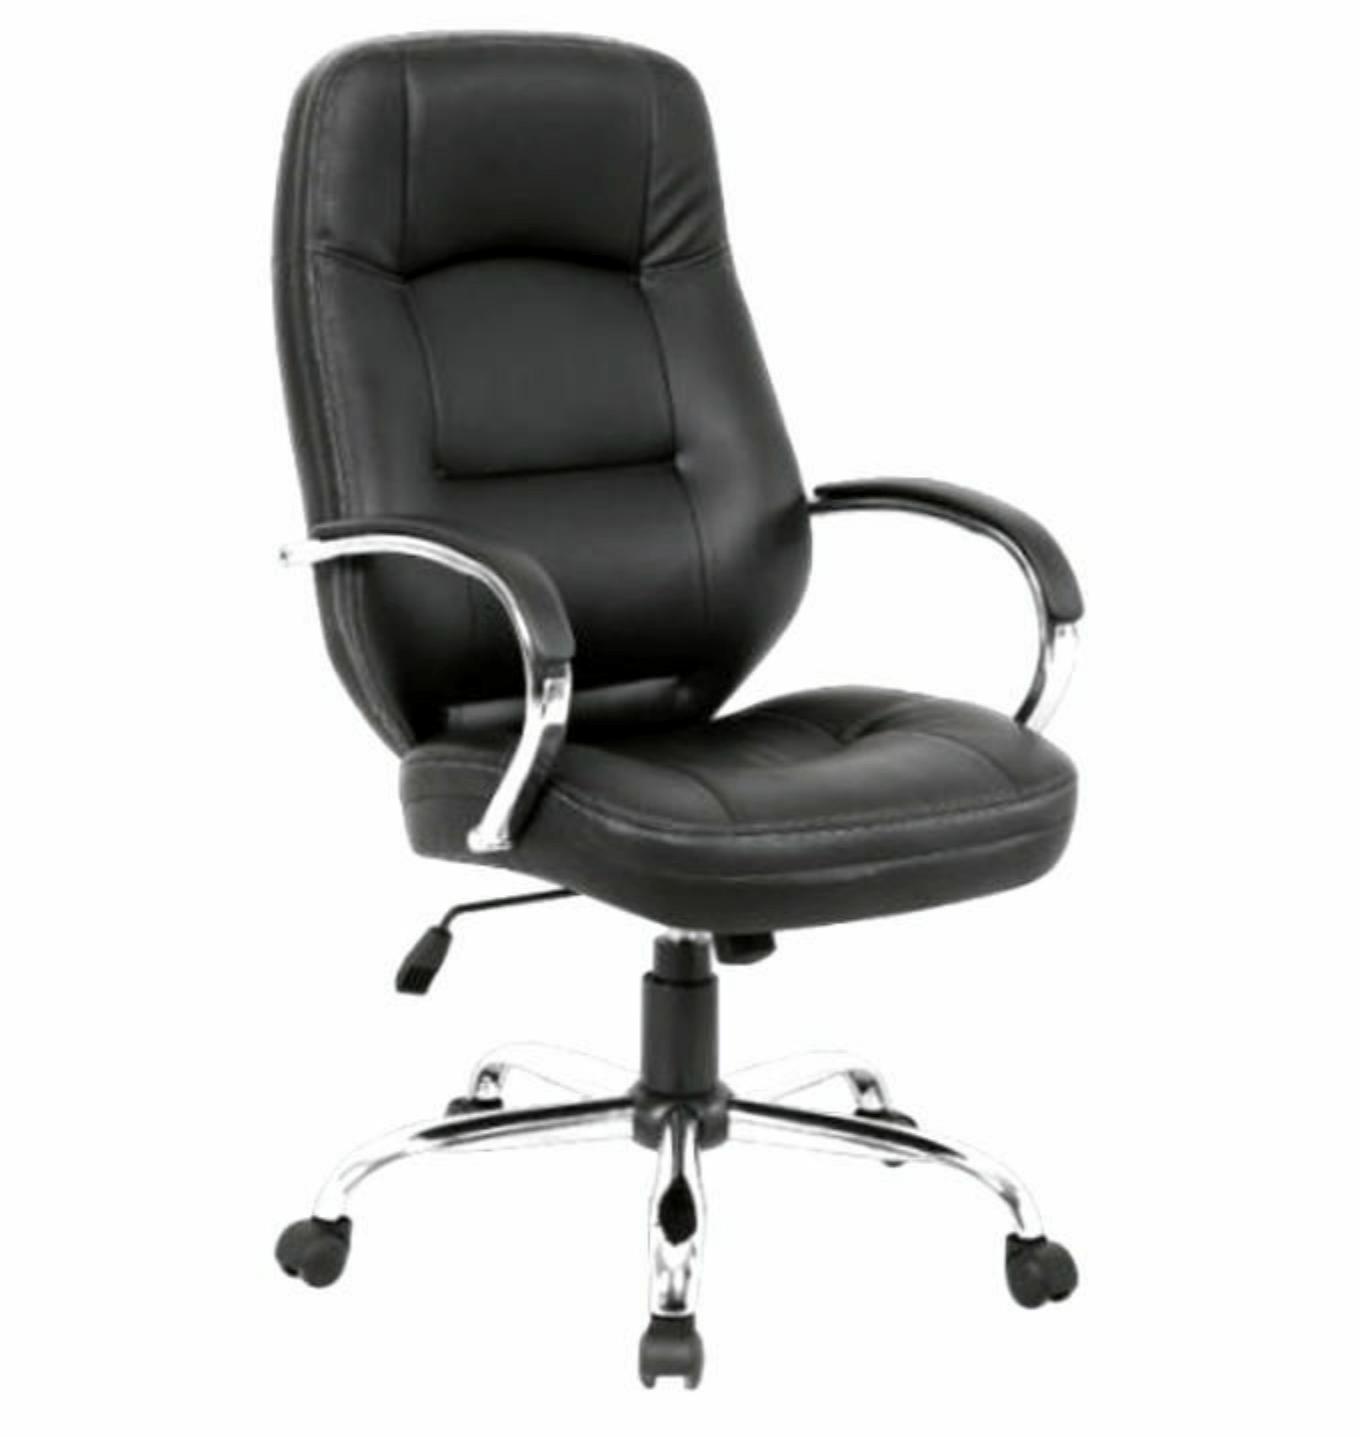 Ambassador High Back Leather Swivel Revolving Office Chair